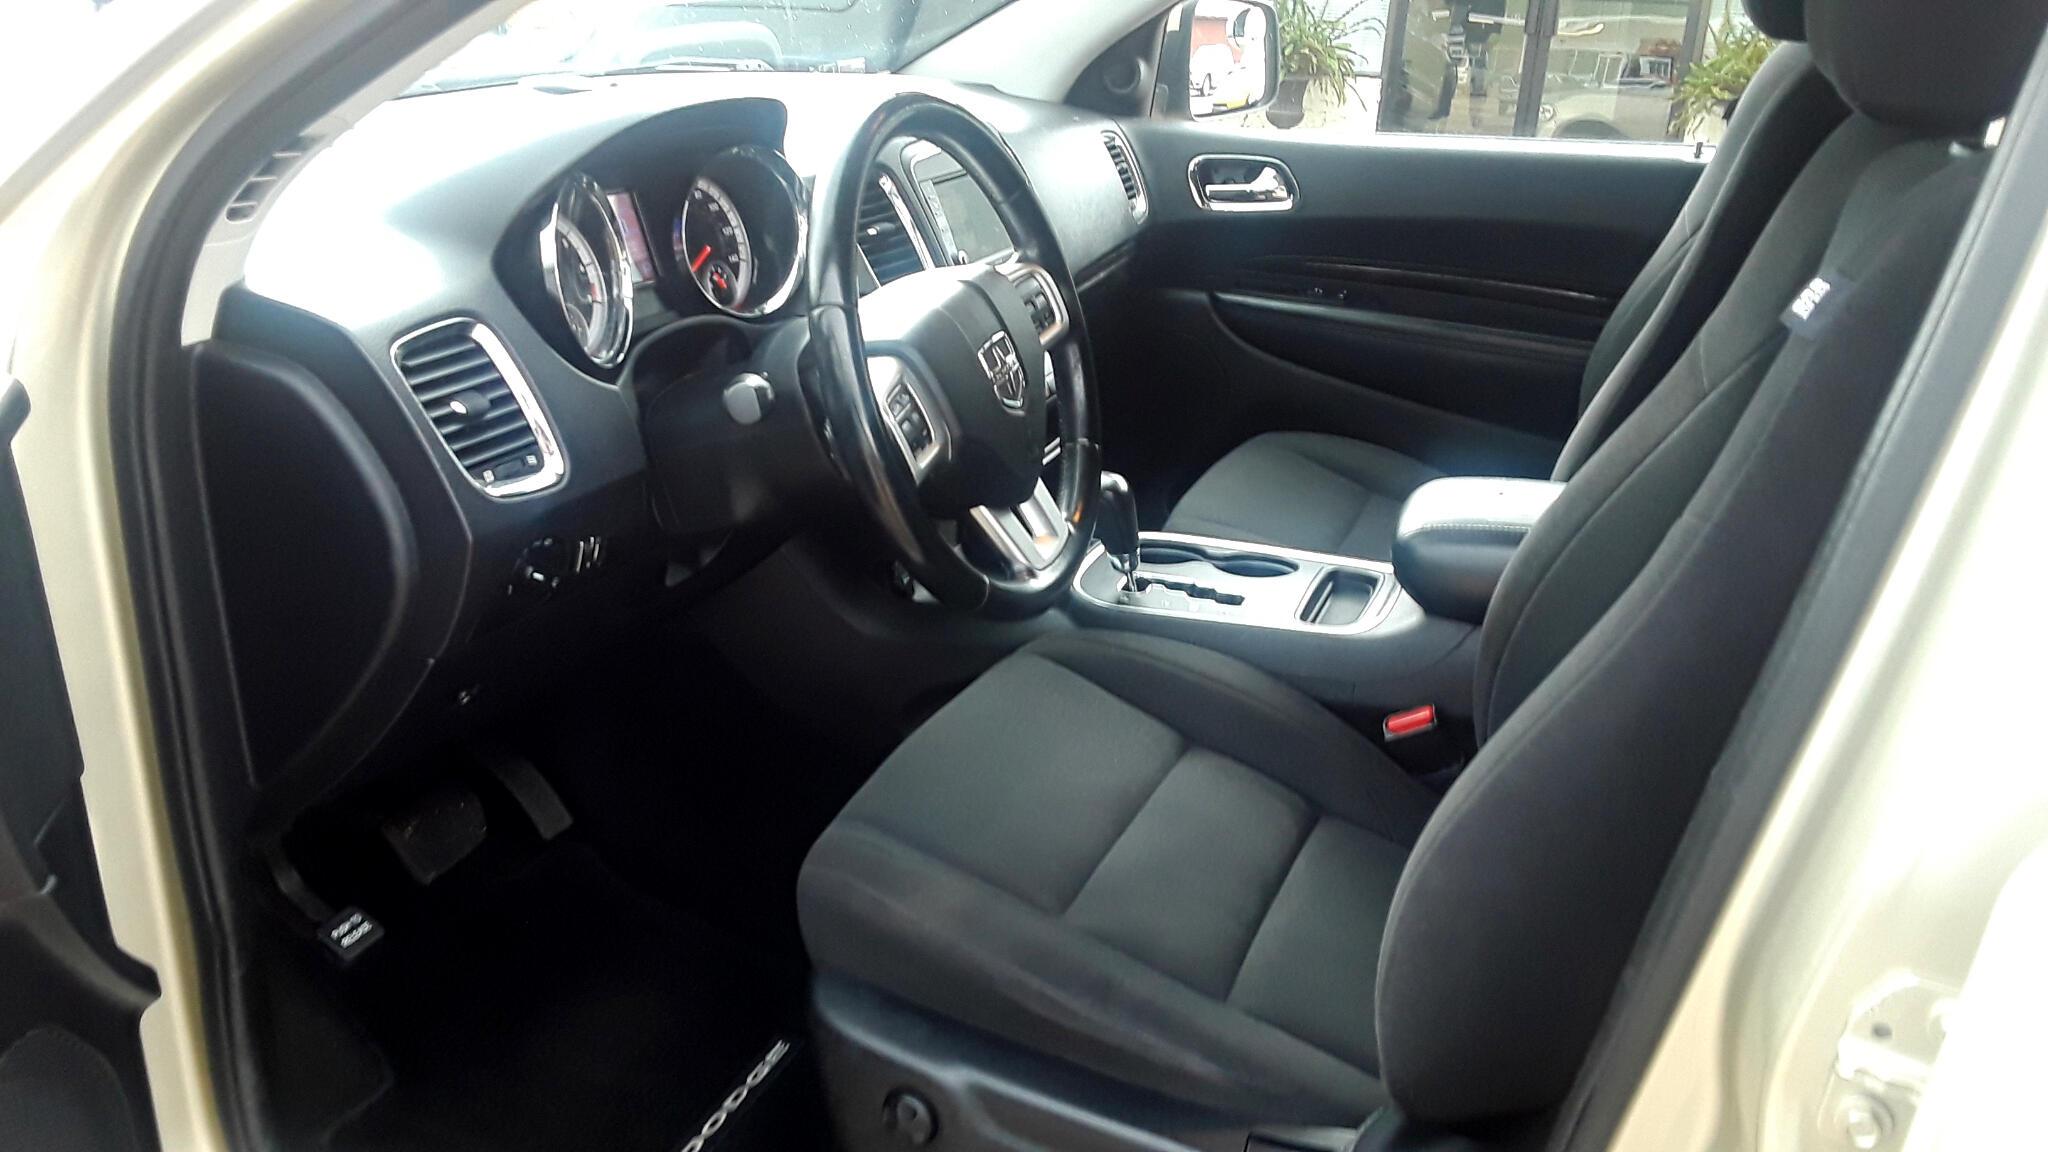 2011 Dodge Durango 2WD 4dr SLT